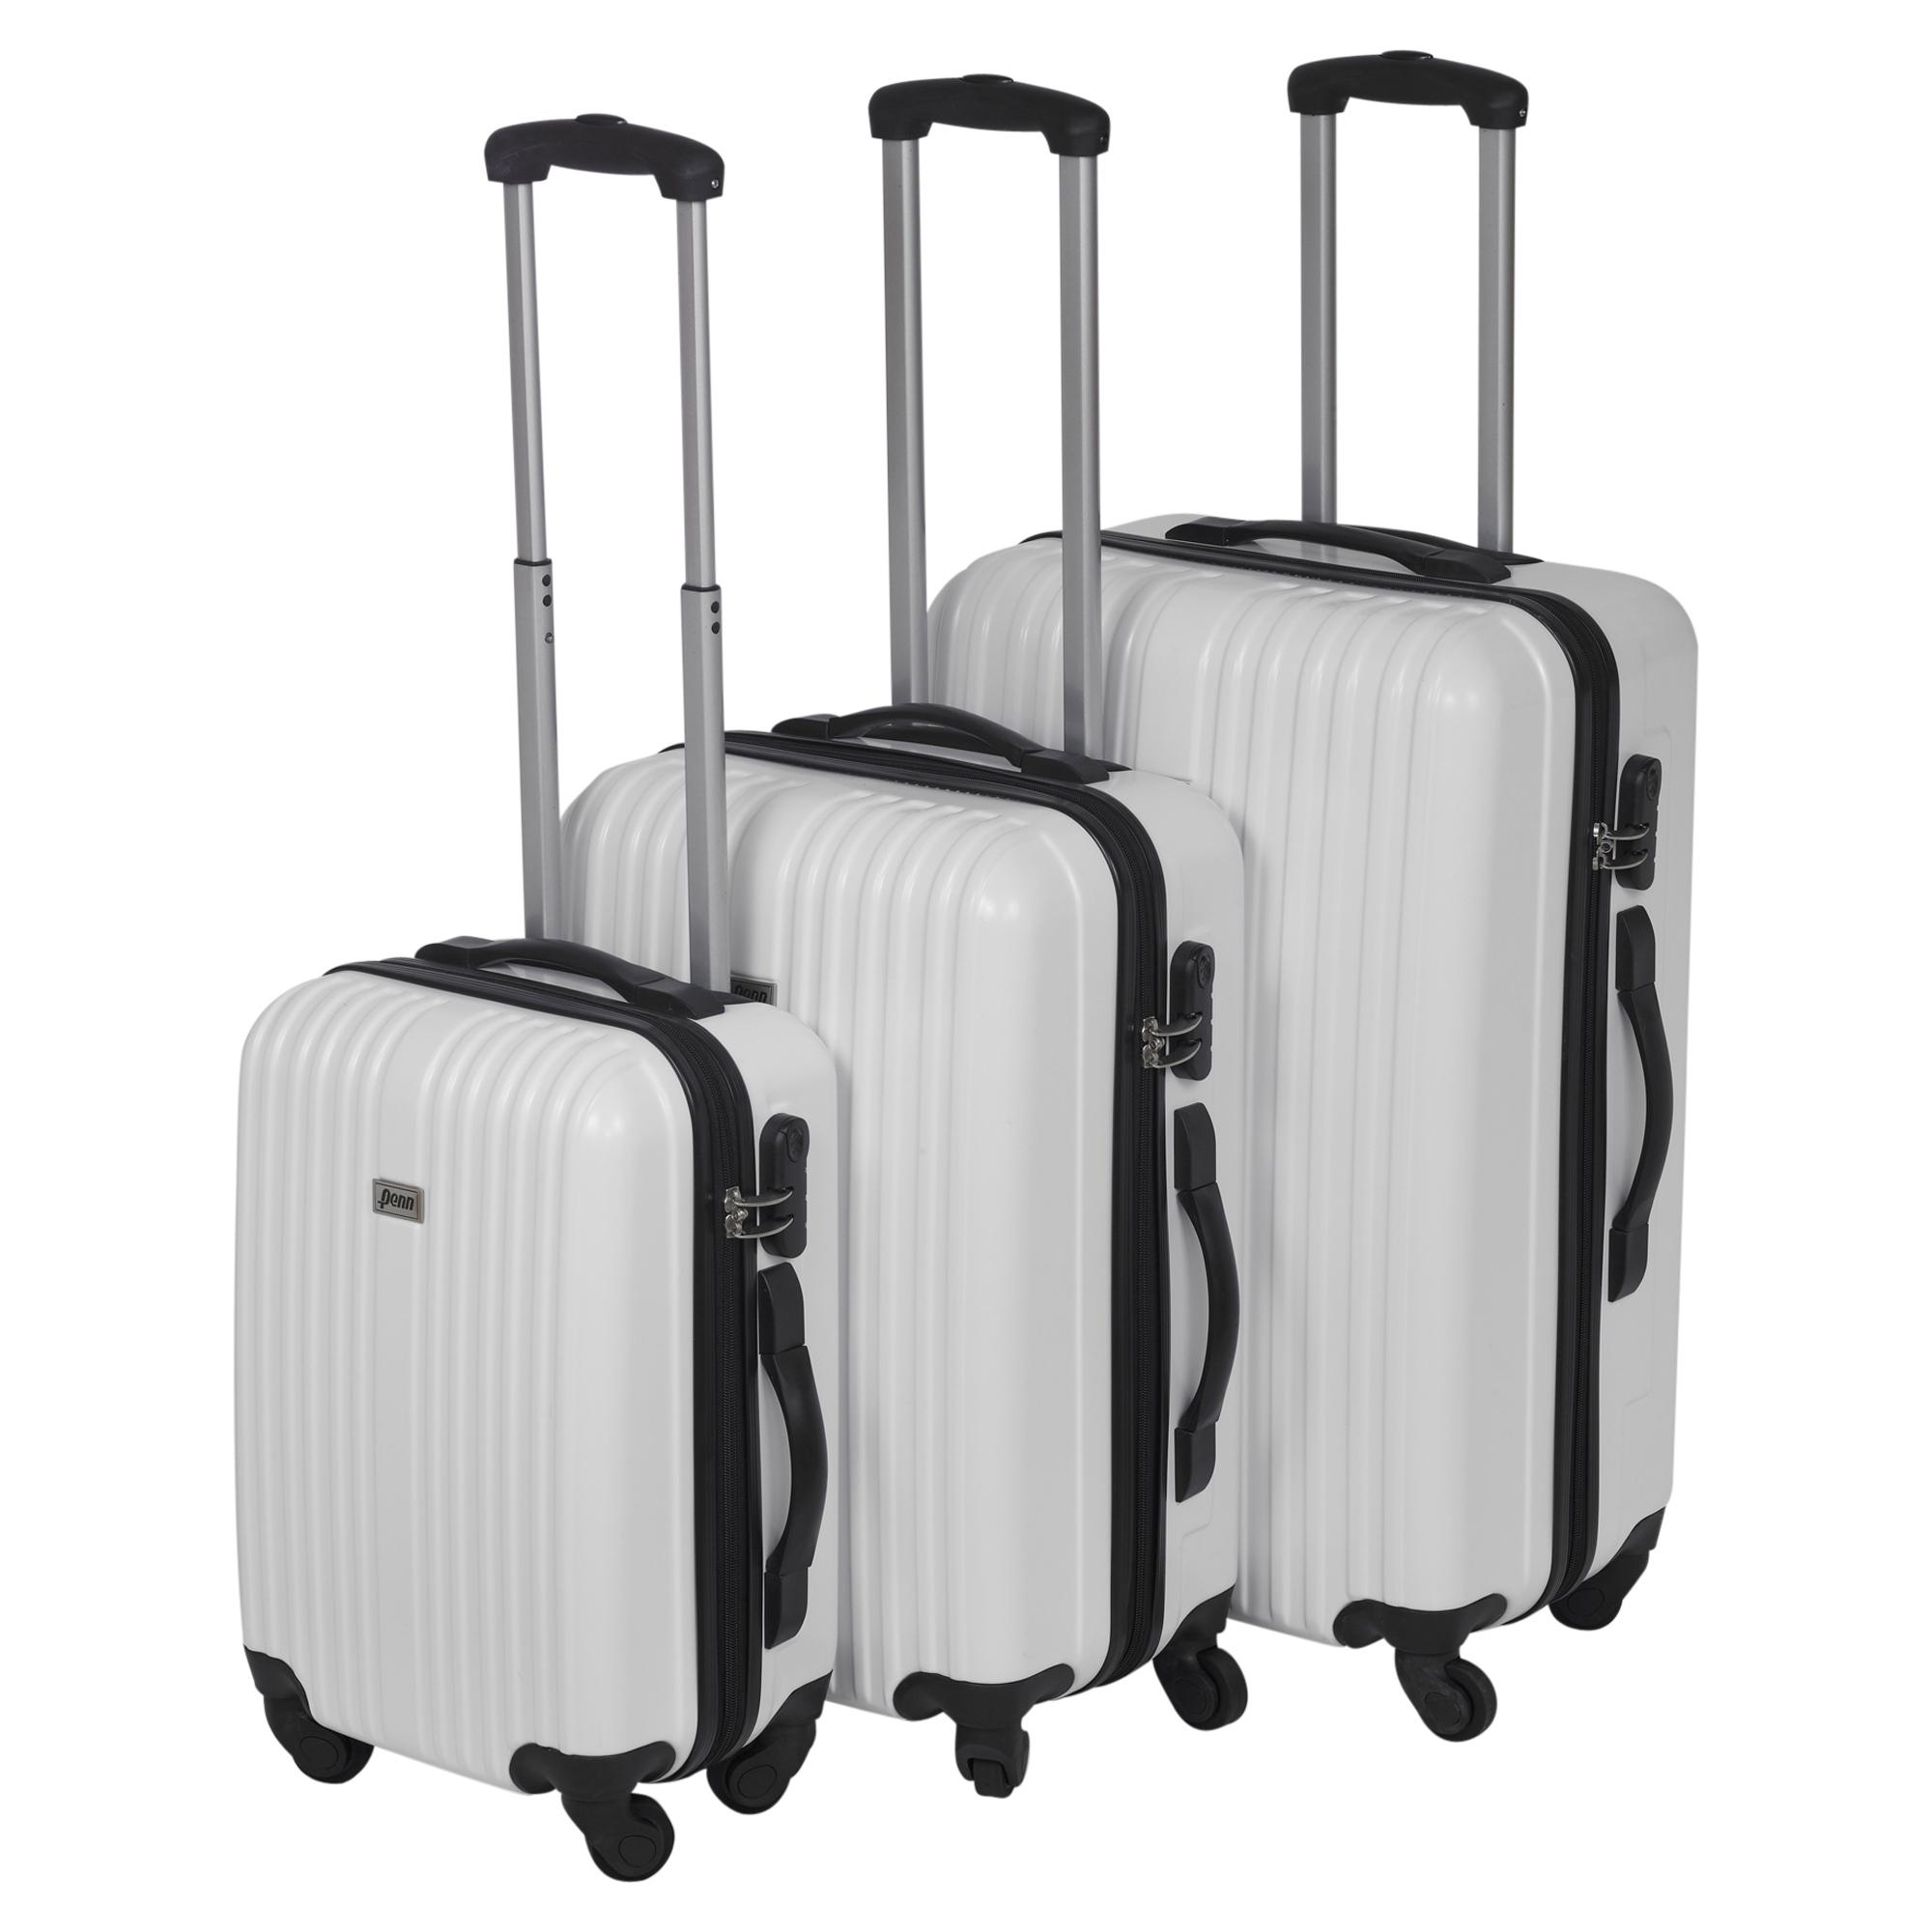 3 x Penn Lightweight Trolley Wheel Suitcase Luggage Travel Baggage Bag Cases Set